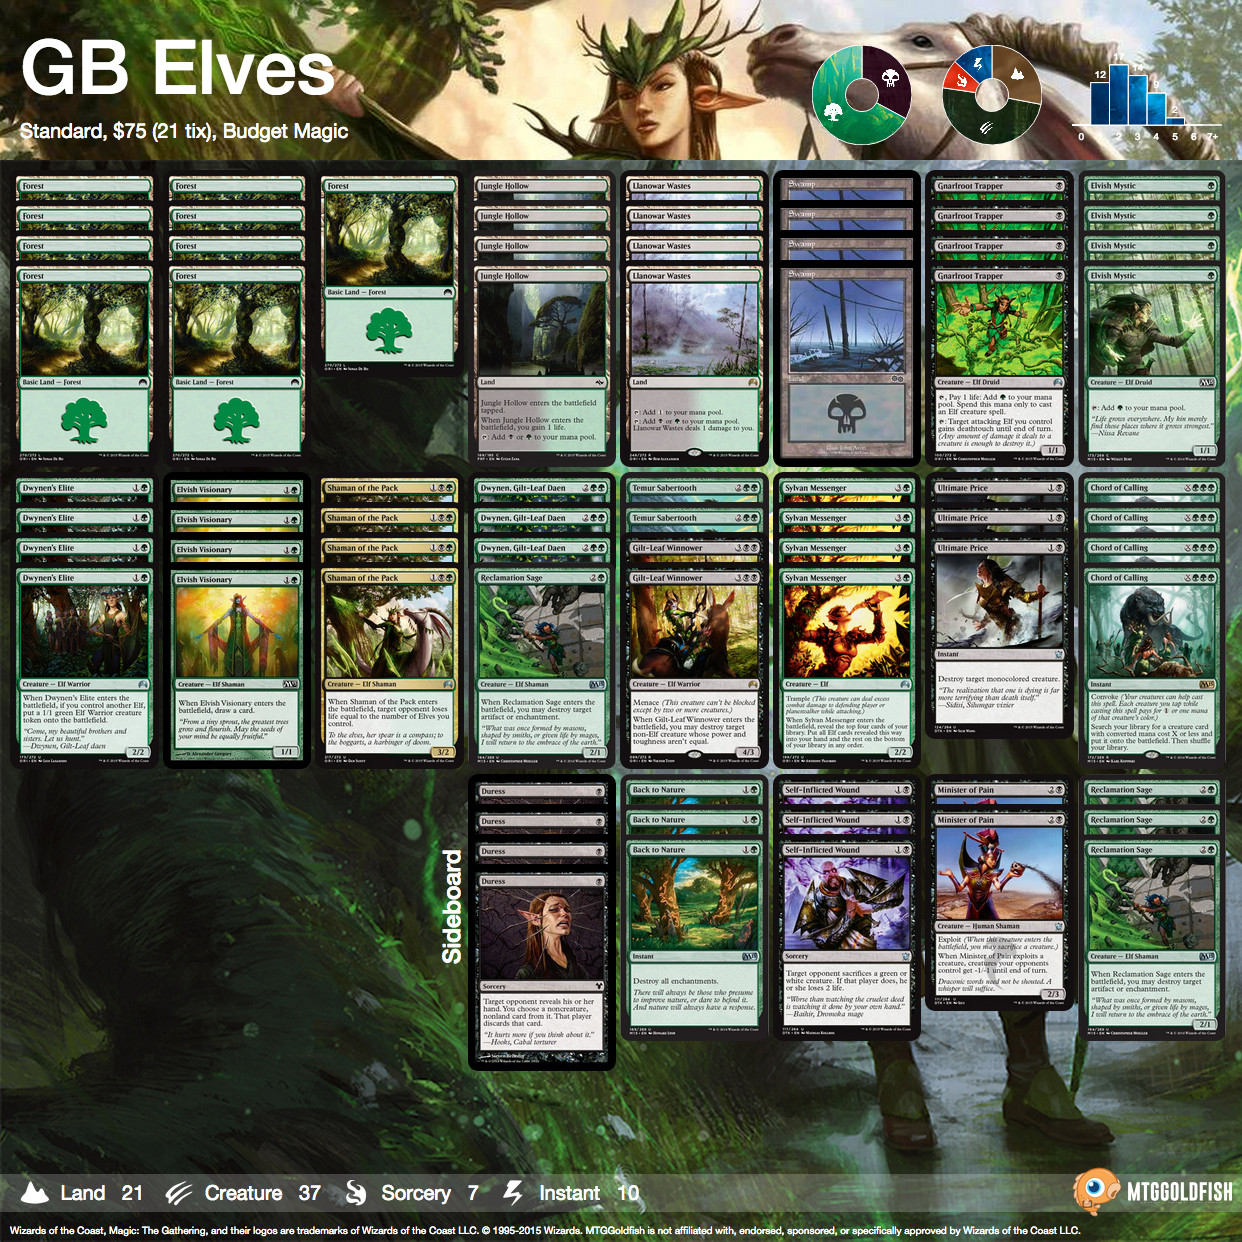 Budgetmagic bg elves